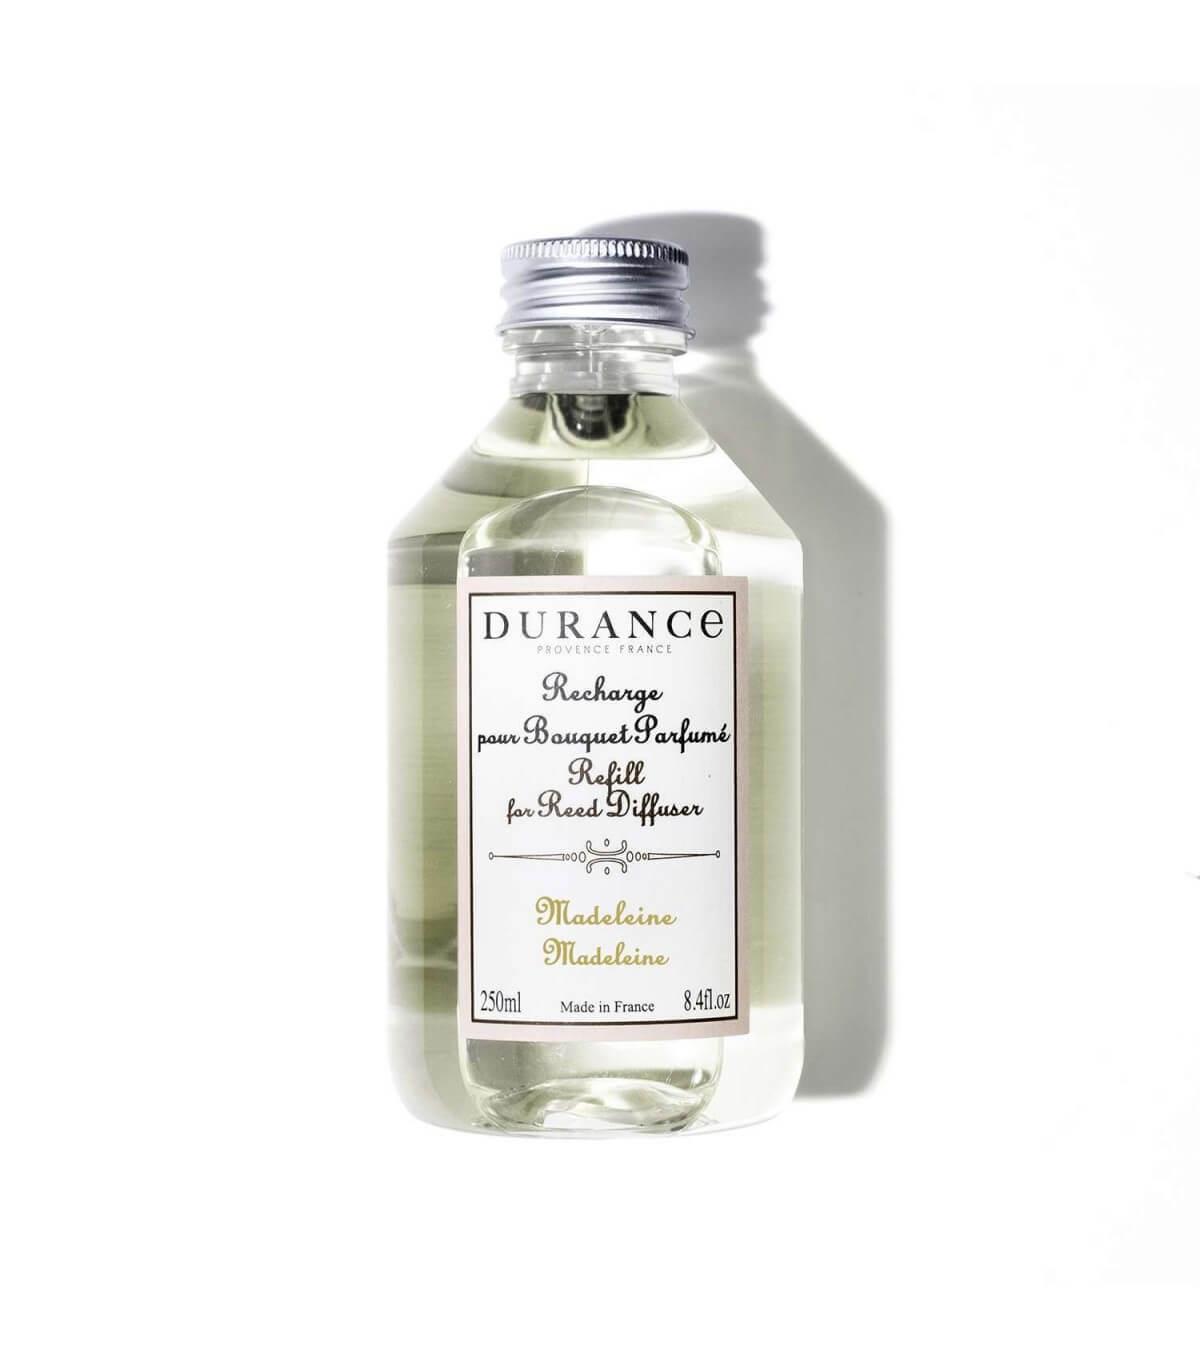 Recharge diffuseur parfum madeleine